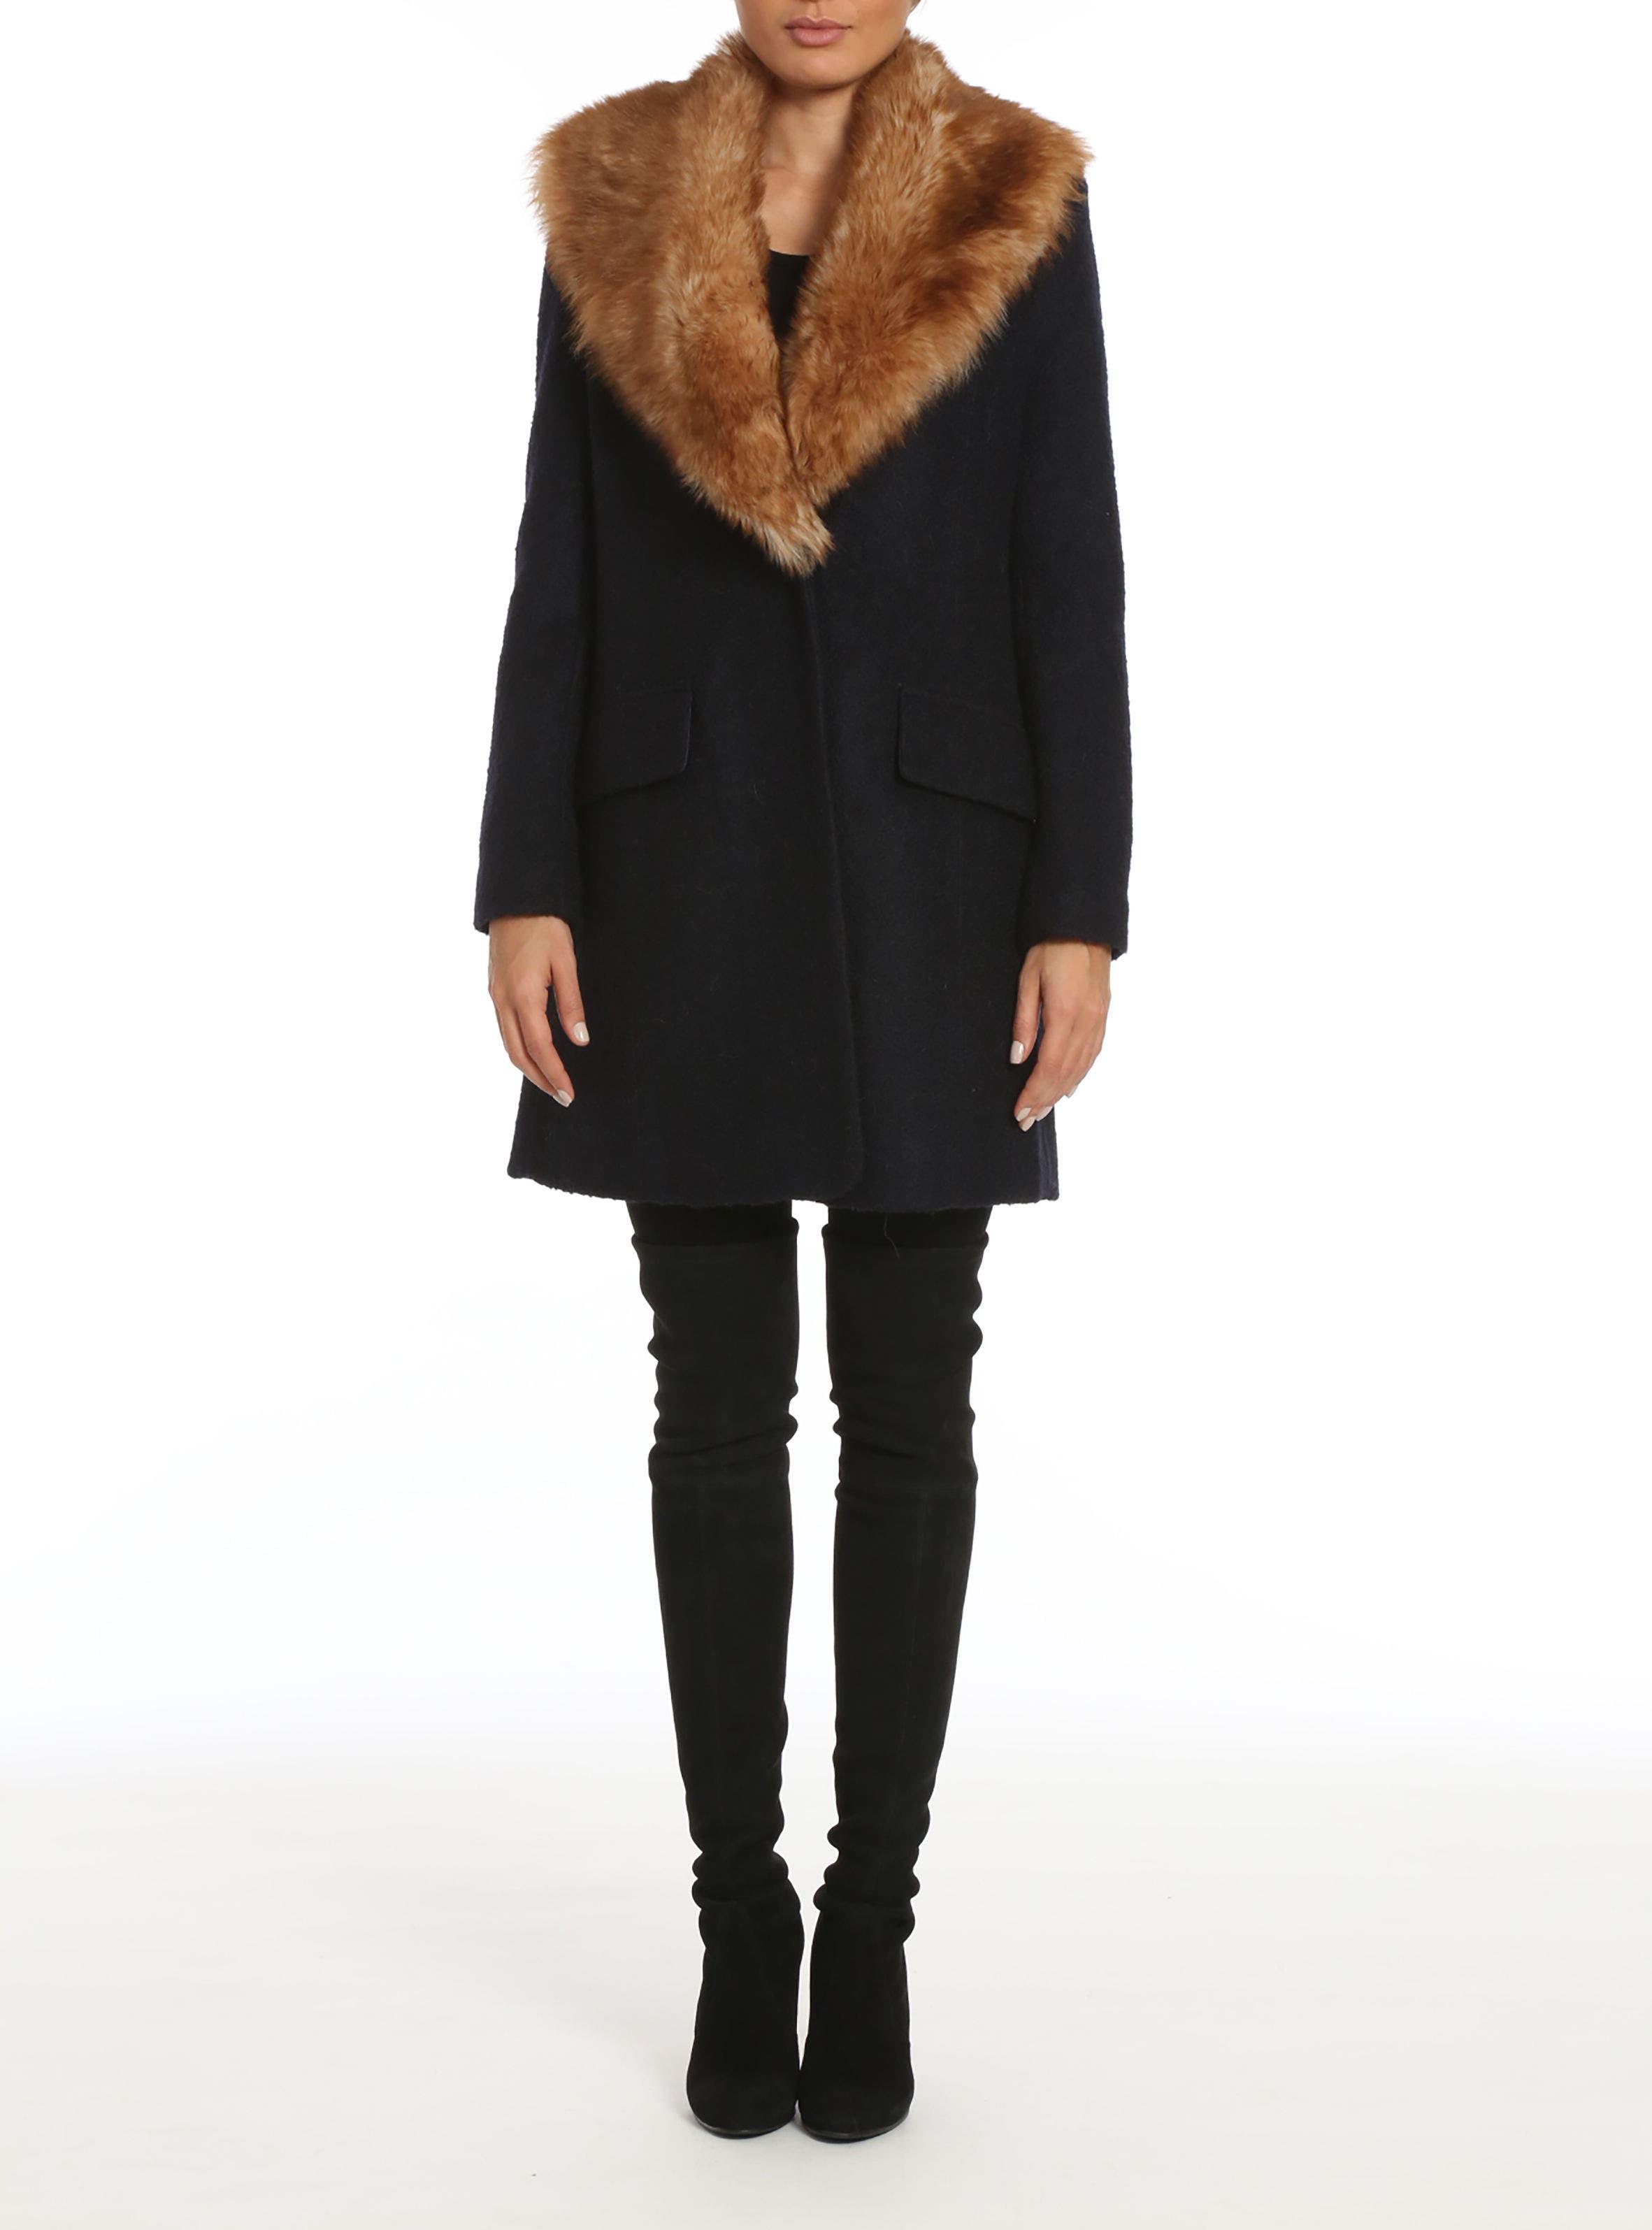 Belle Badgley Mischka 'Holly' Faux Fur Collar Bouclé Coat